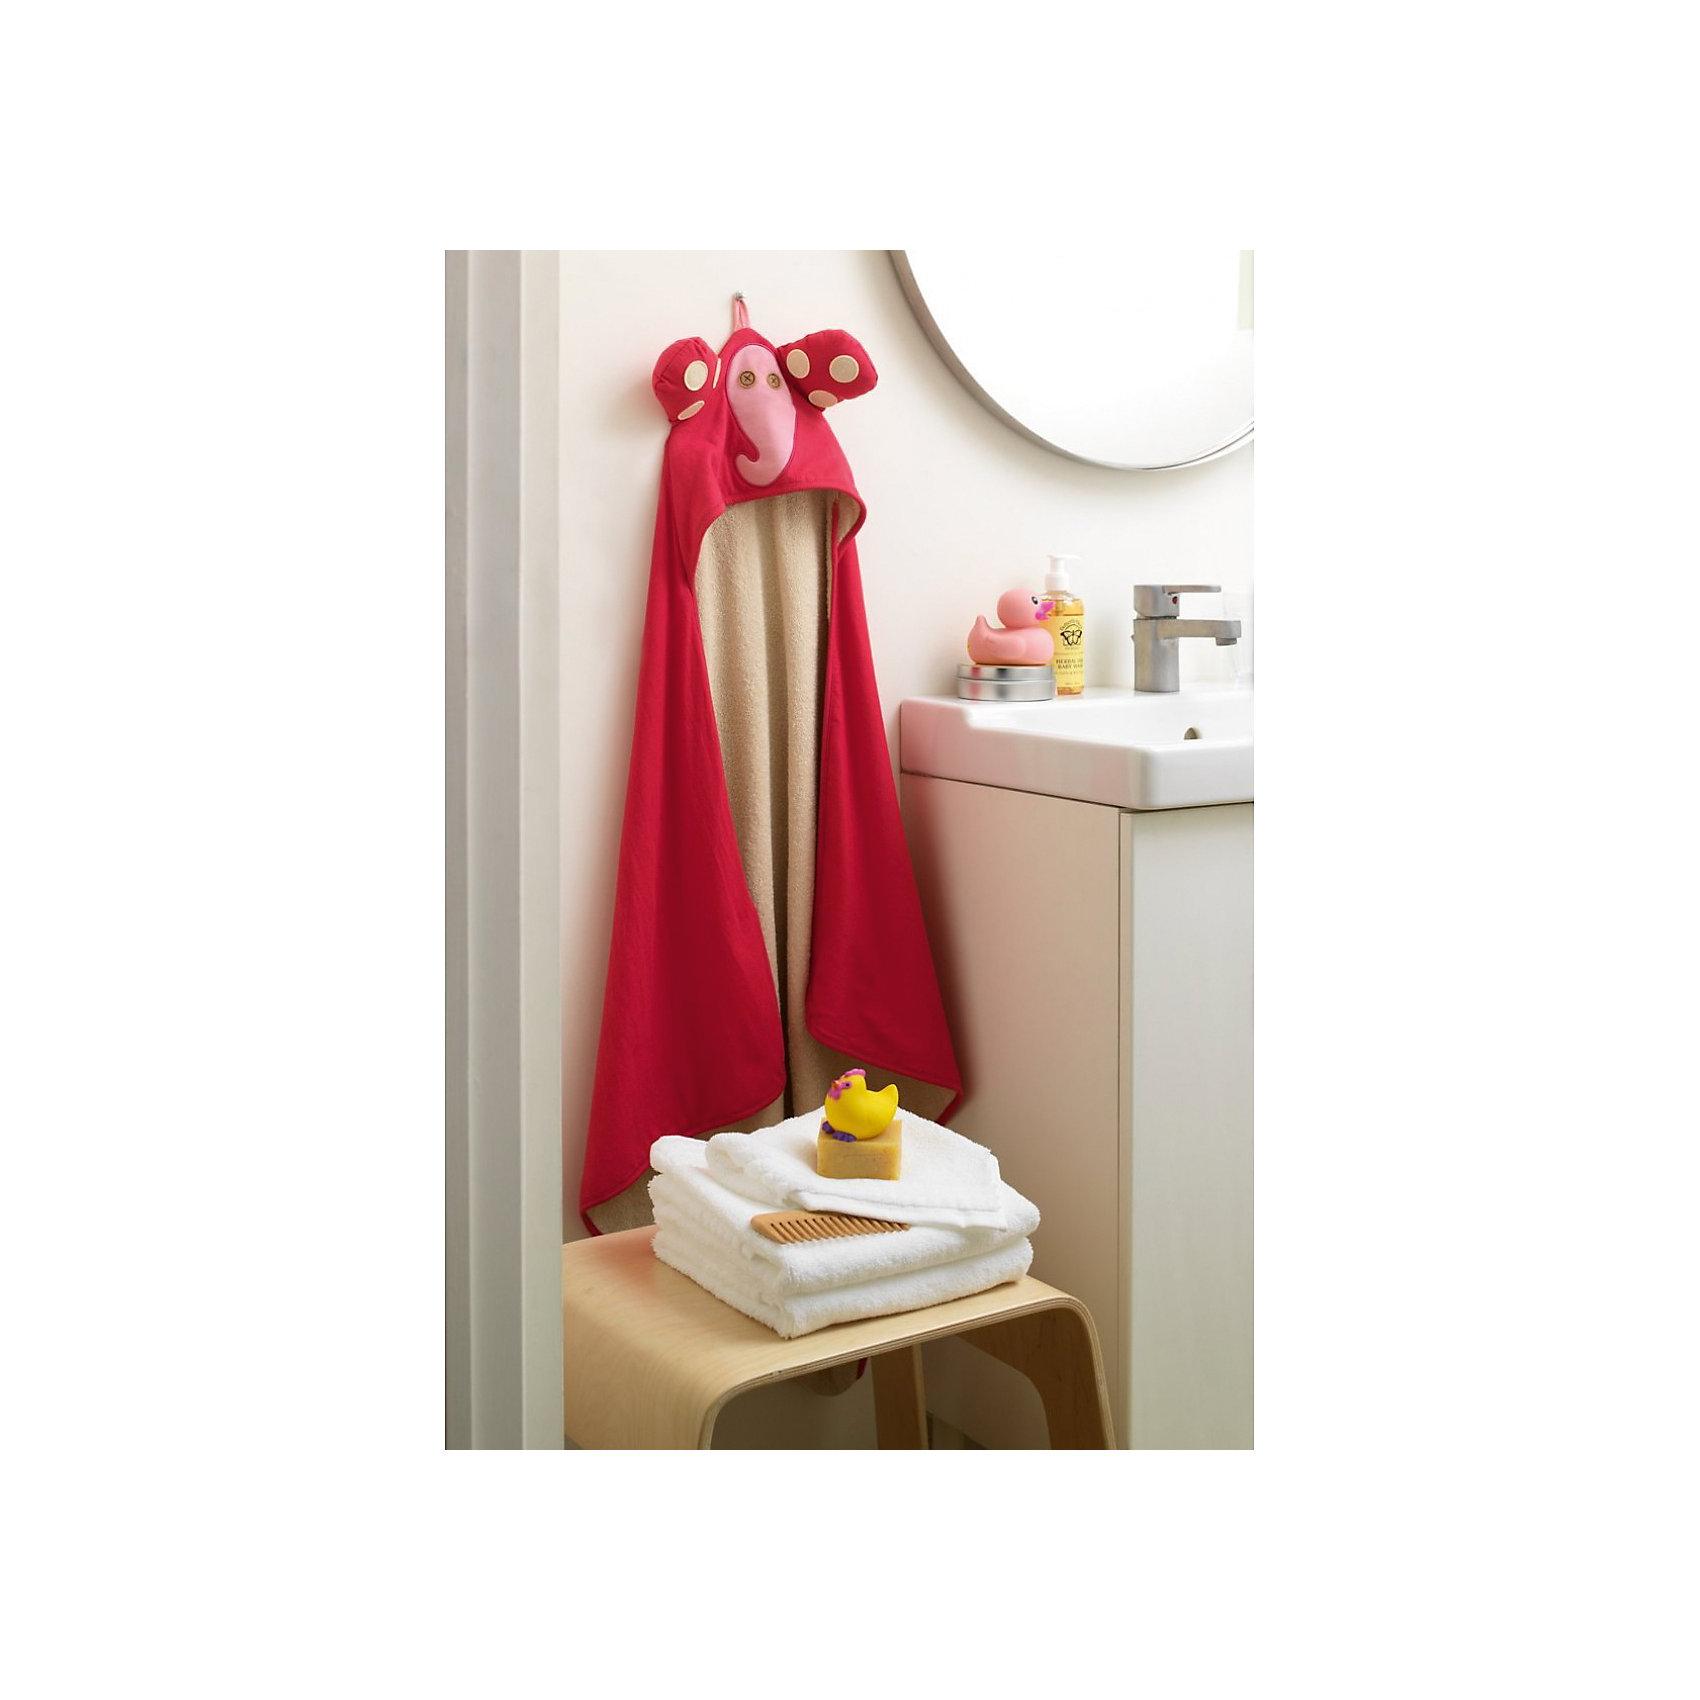 Полотенце с капюшоном Слоник (Pink Elephant), 3 Sprouts